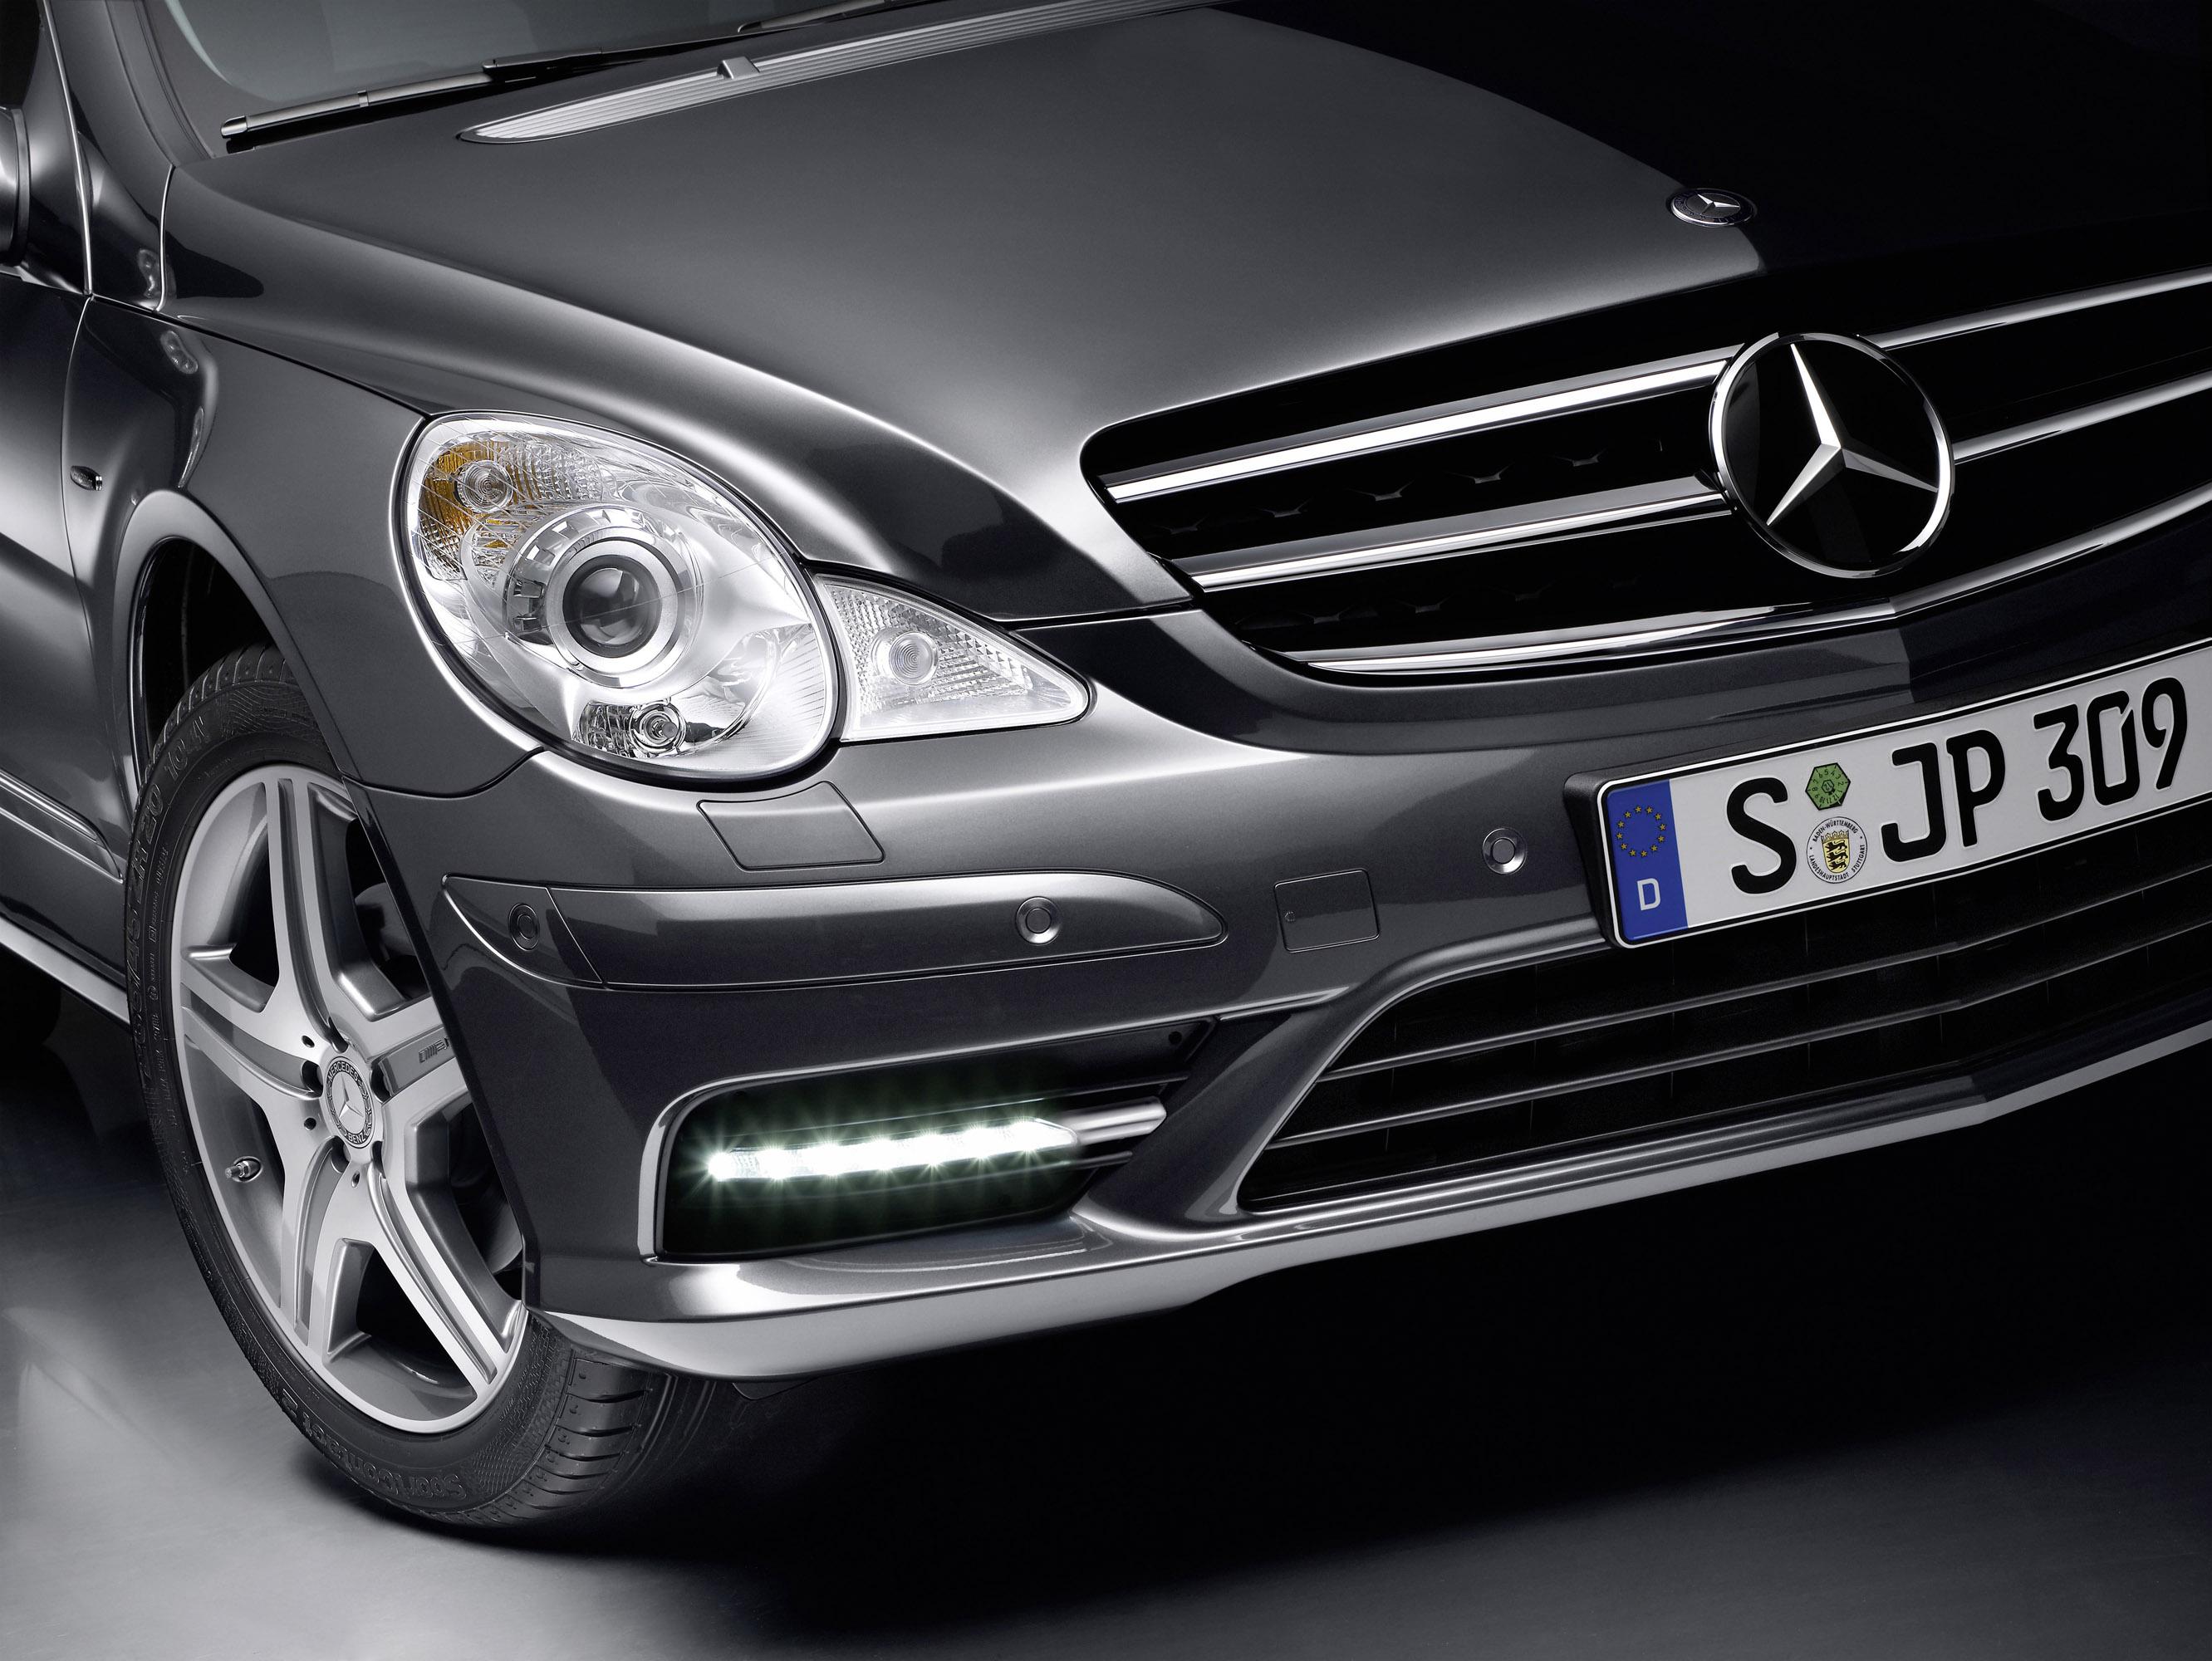 Mercedes Benz R-350 Grand Edition [эксклюзивные фотографии] - фотография №3